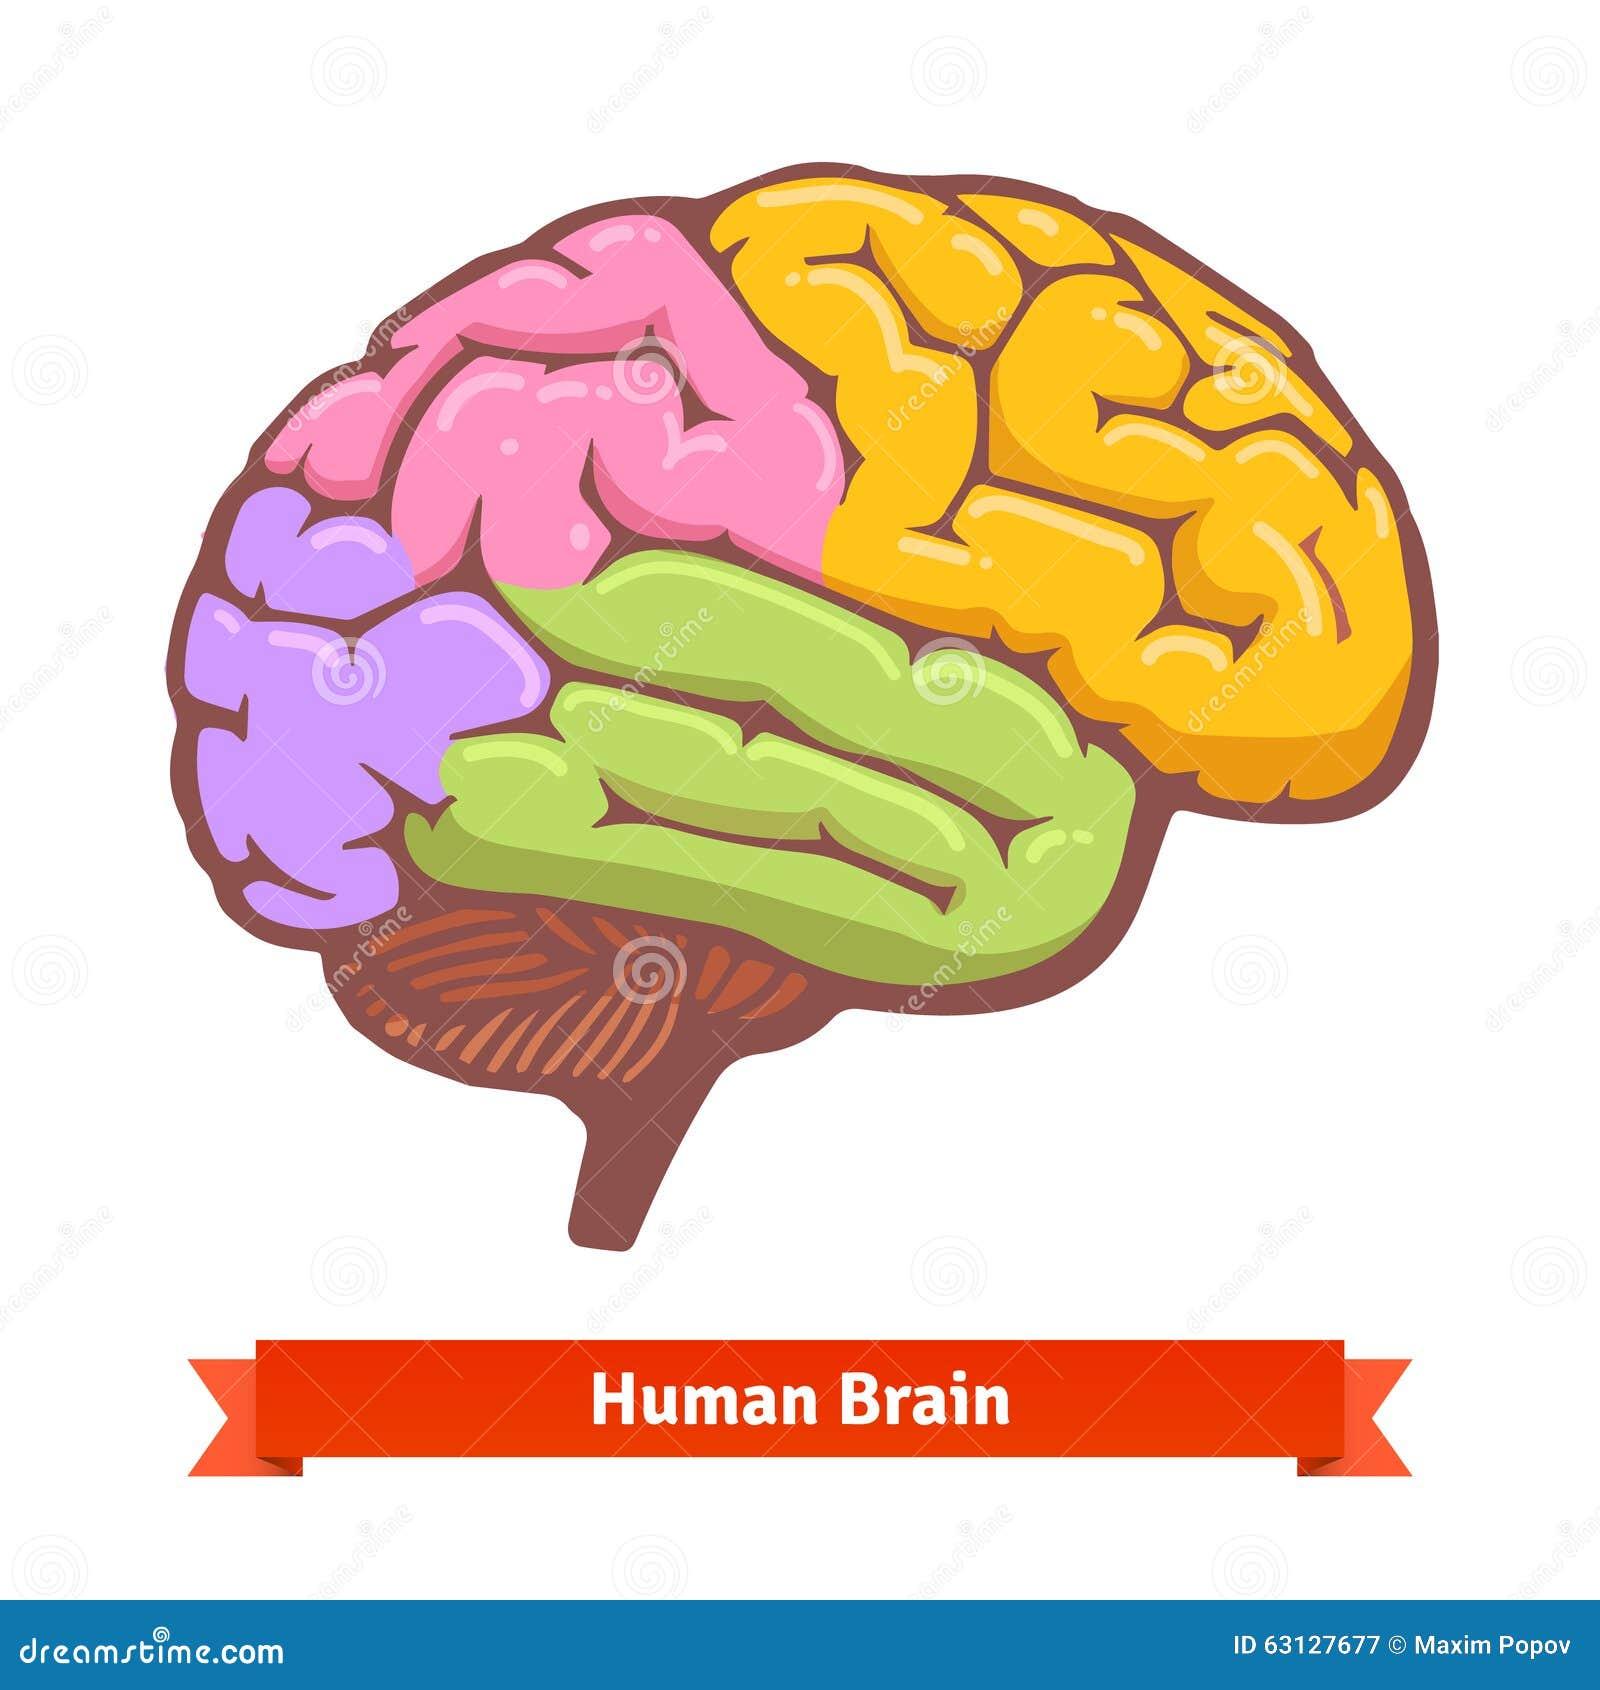 Coloured Human Brain Diagram Stock Vector Illustration Of Cerebrum